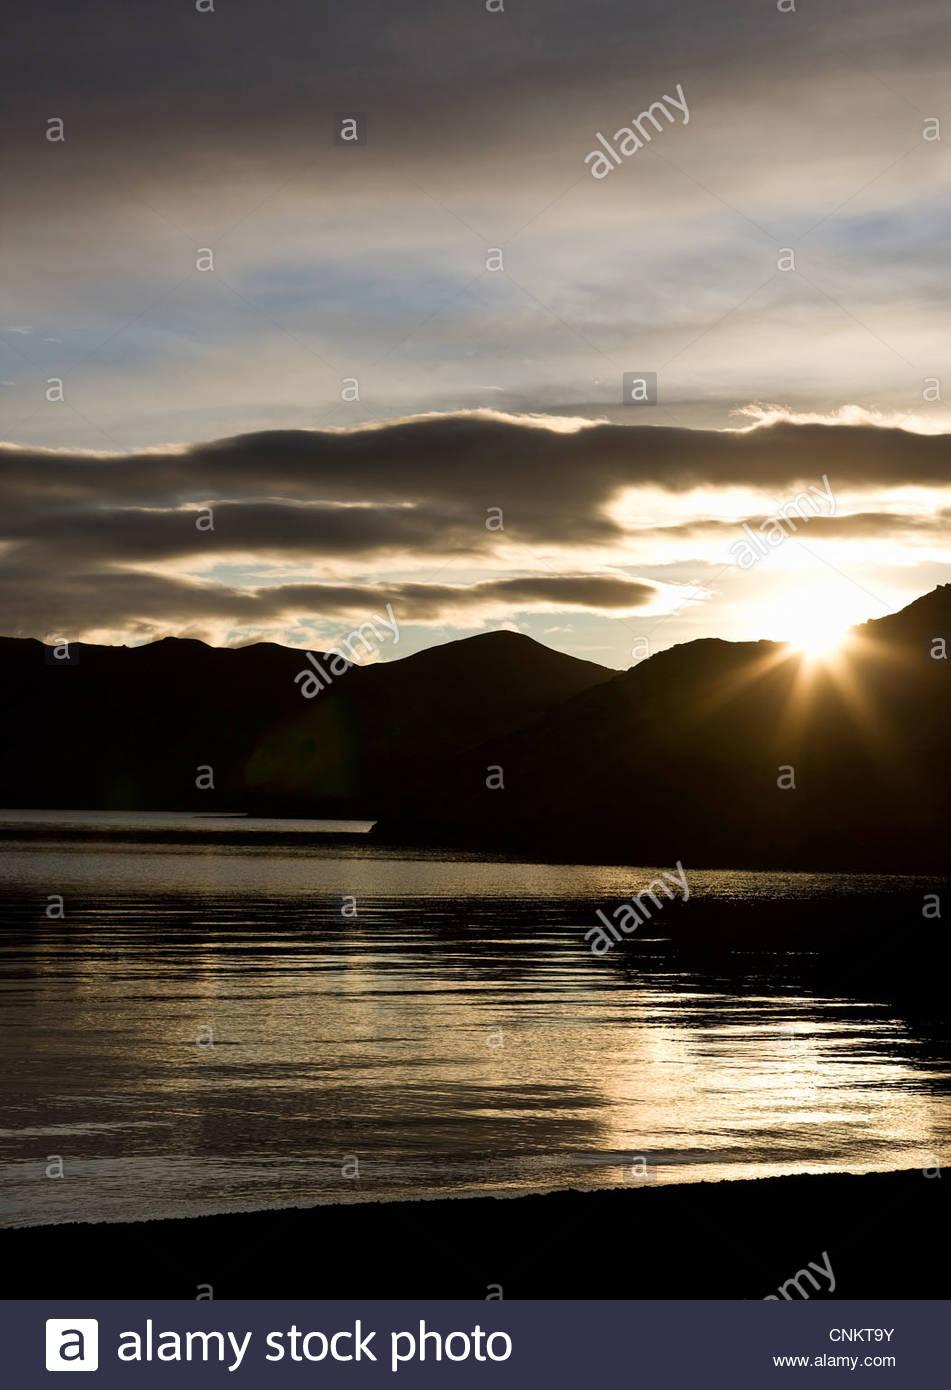 Sun setting over mountain range - Stock Image